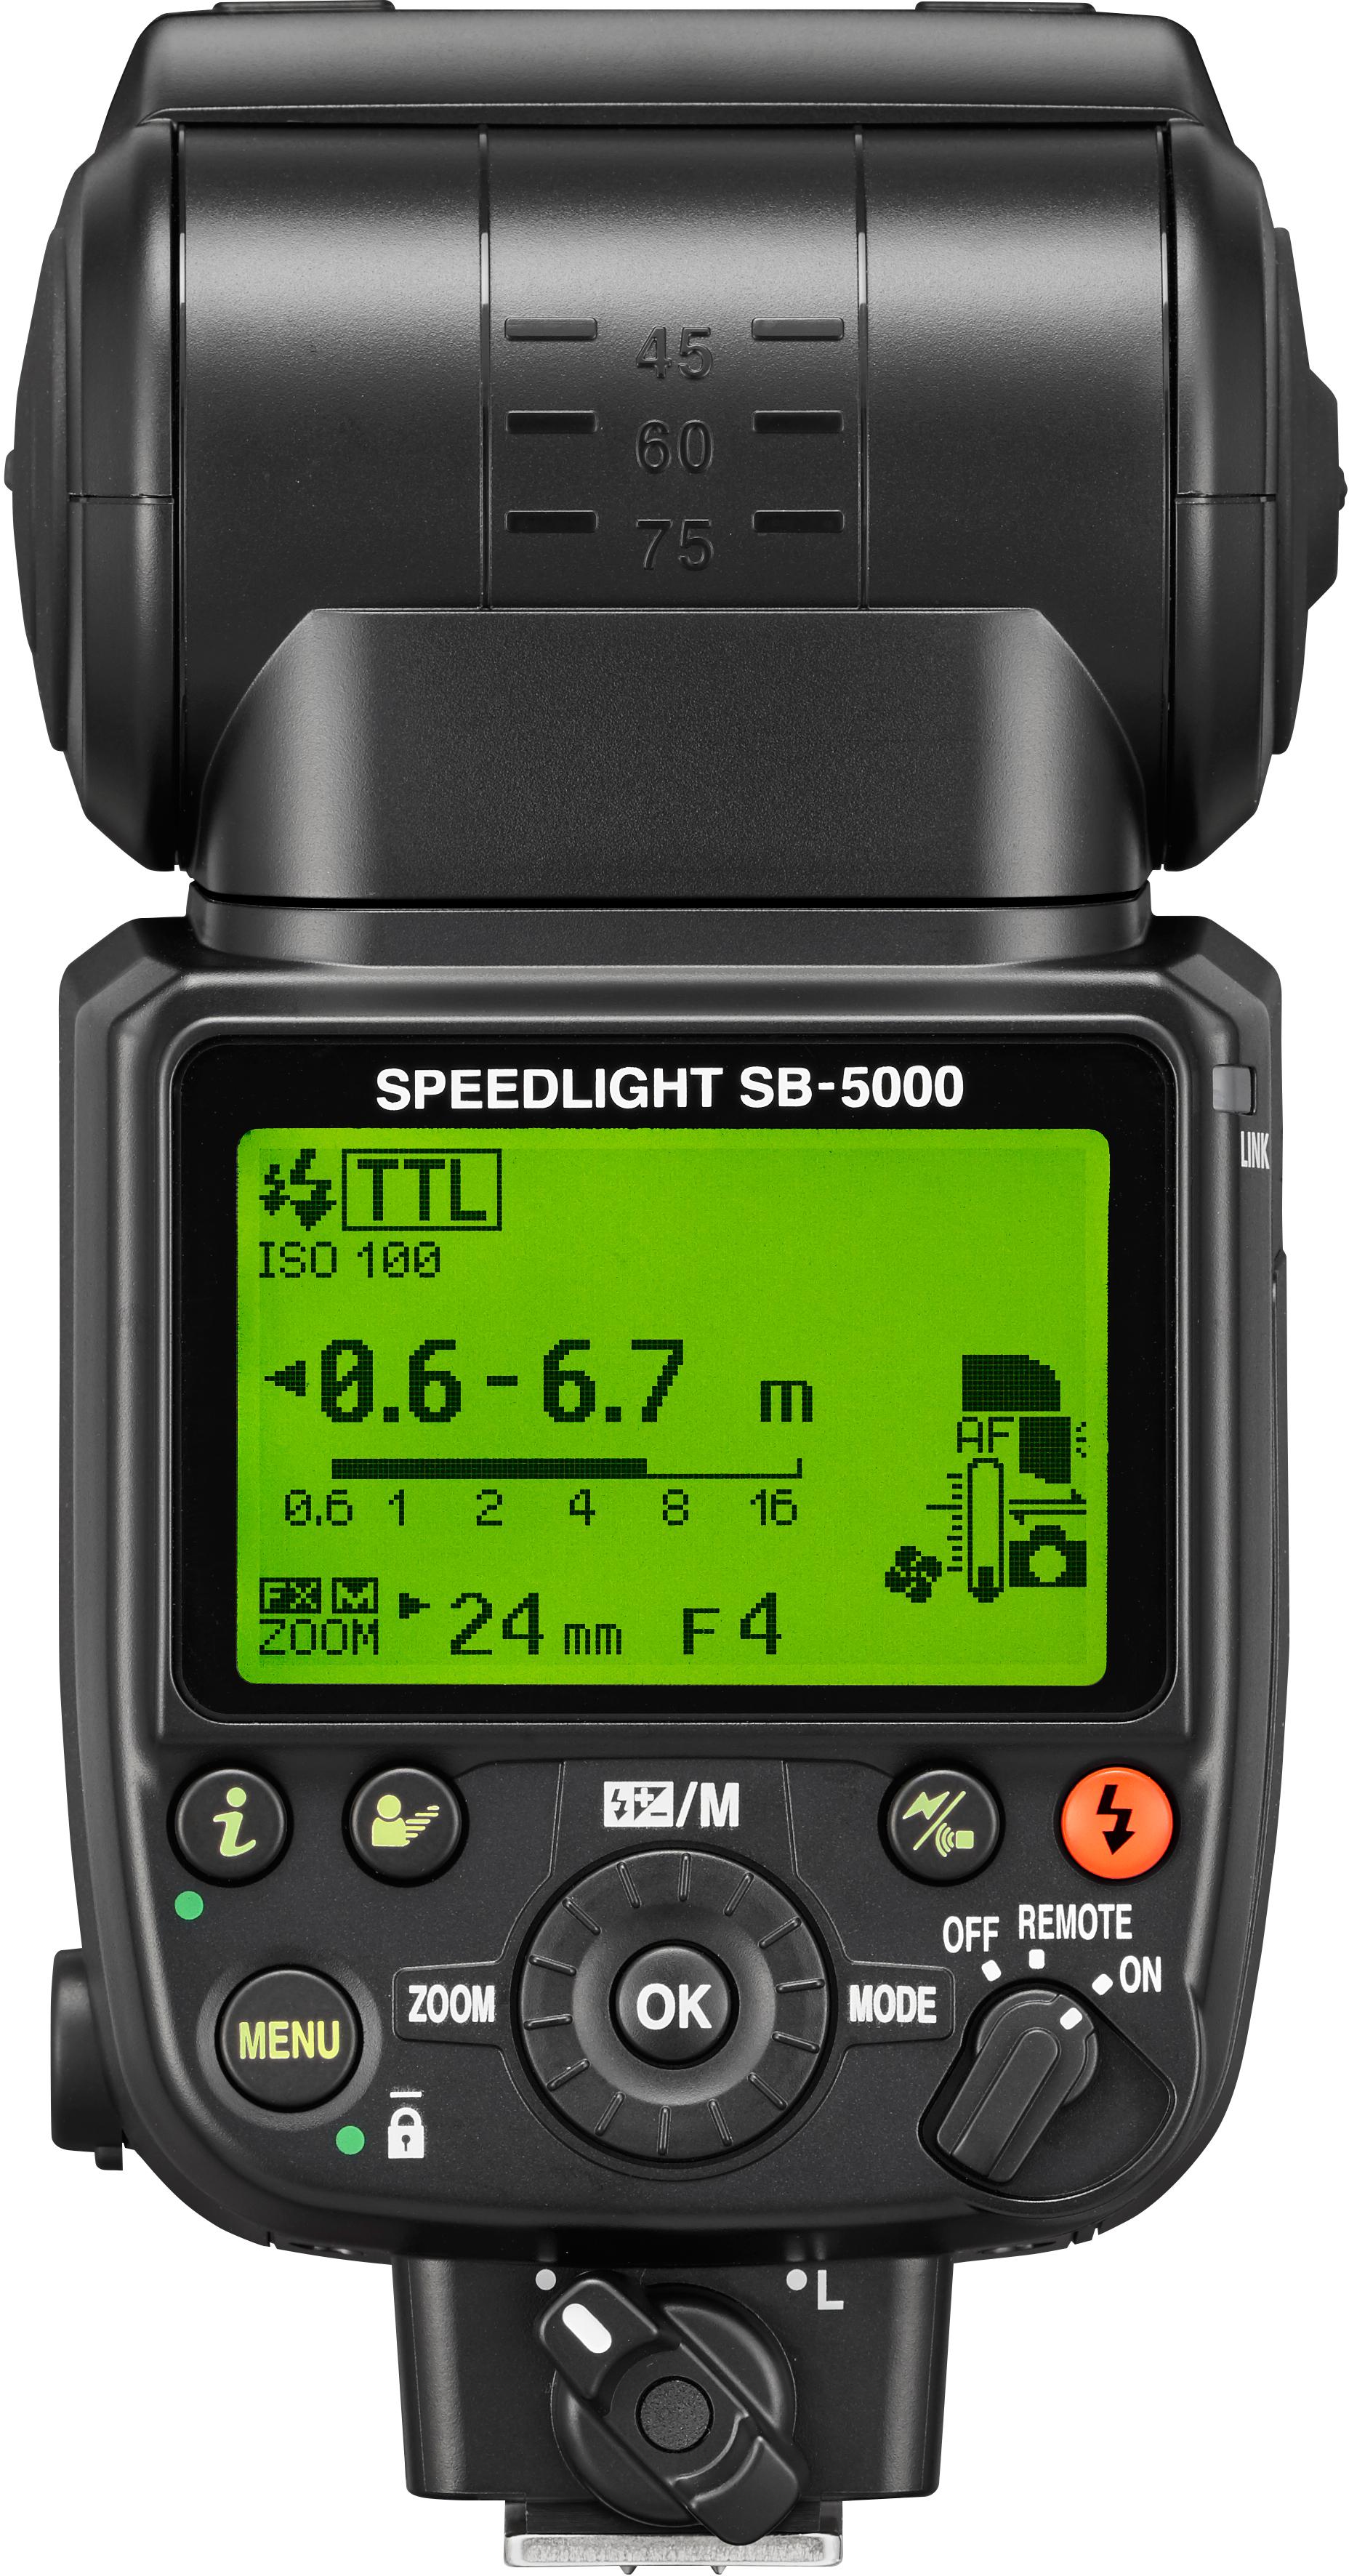 Unveiled nikon 39 s 4k capable d5 dx format d500 radio for Flash nikon sb 500